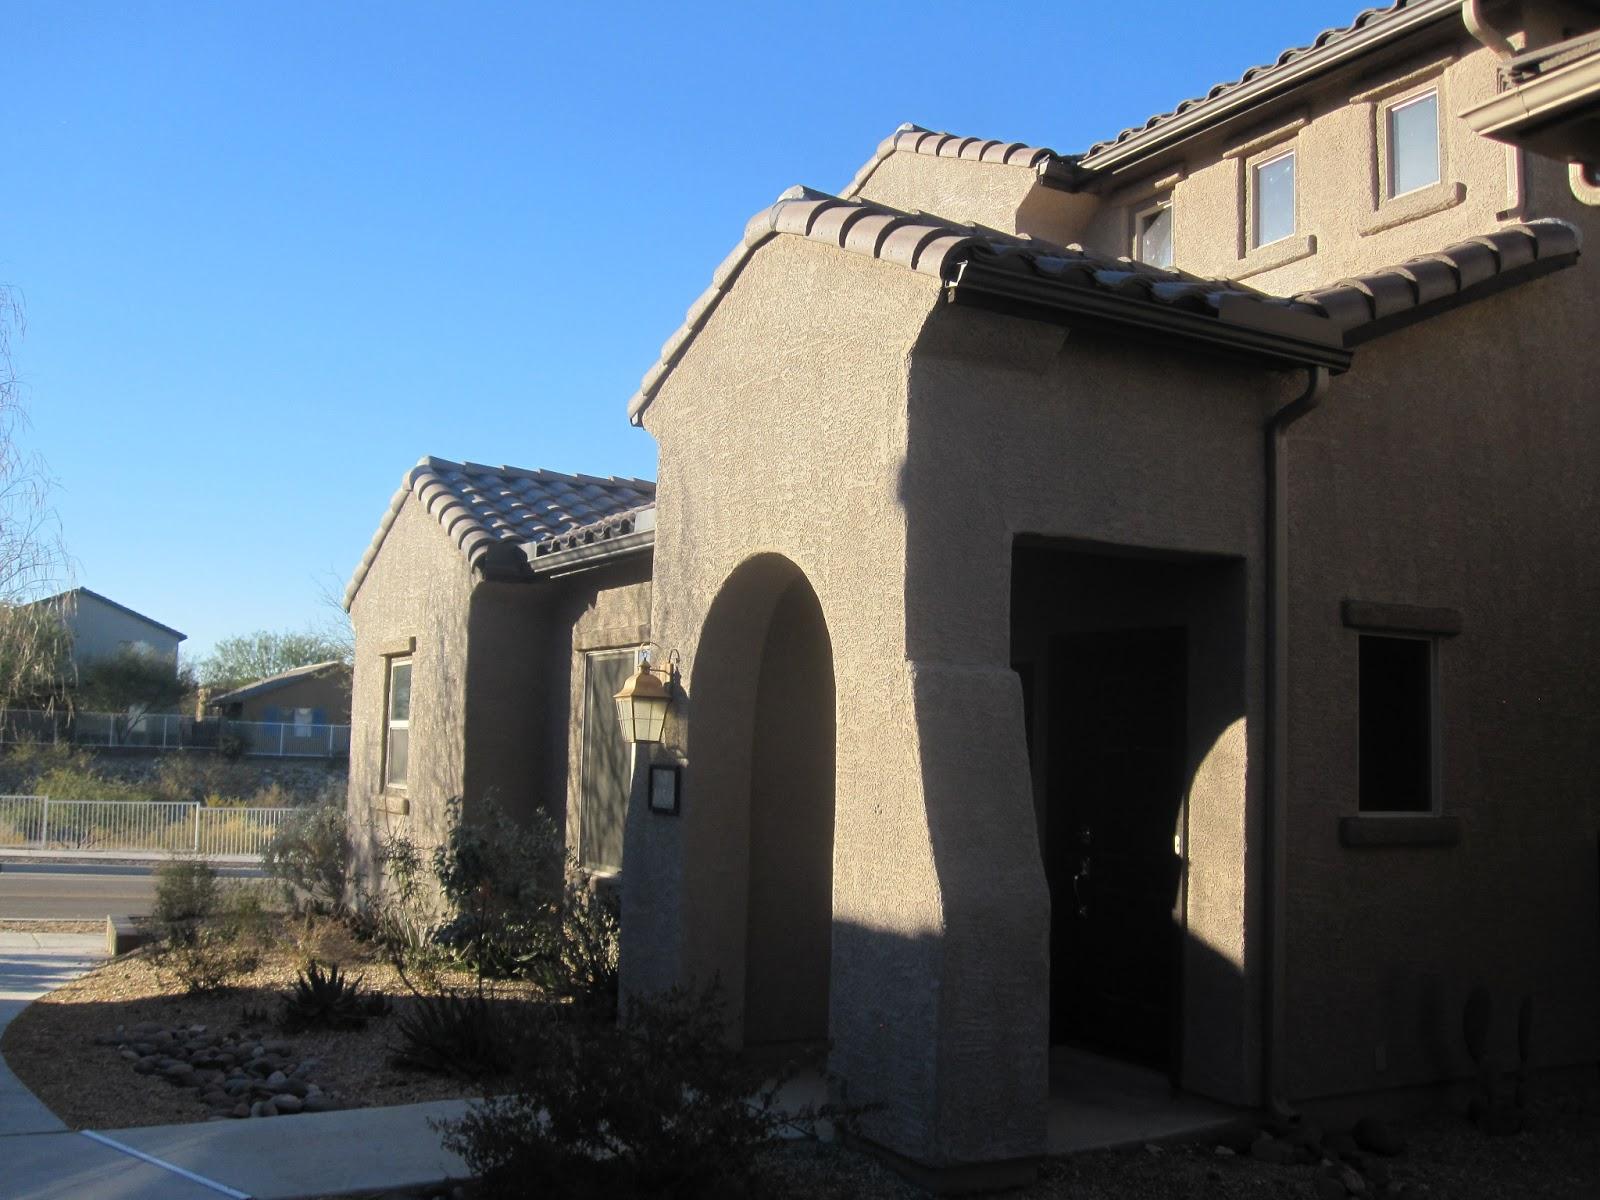 10566 e forest falls tucson az home for rent - 4 bedroom houses for rent in tucson az ...